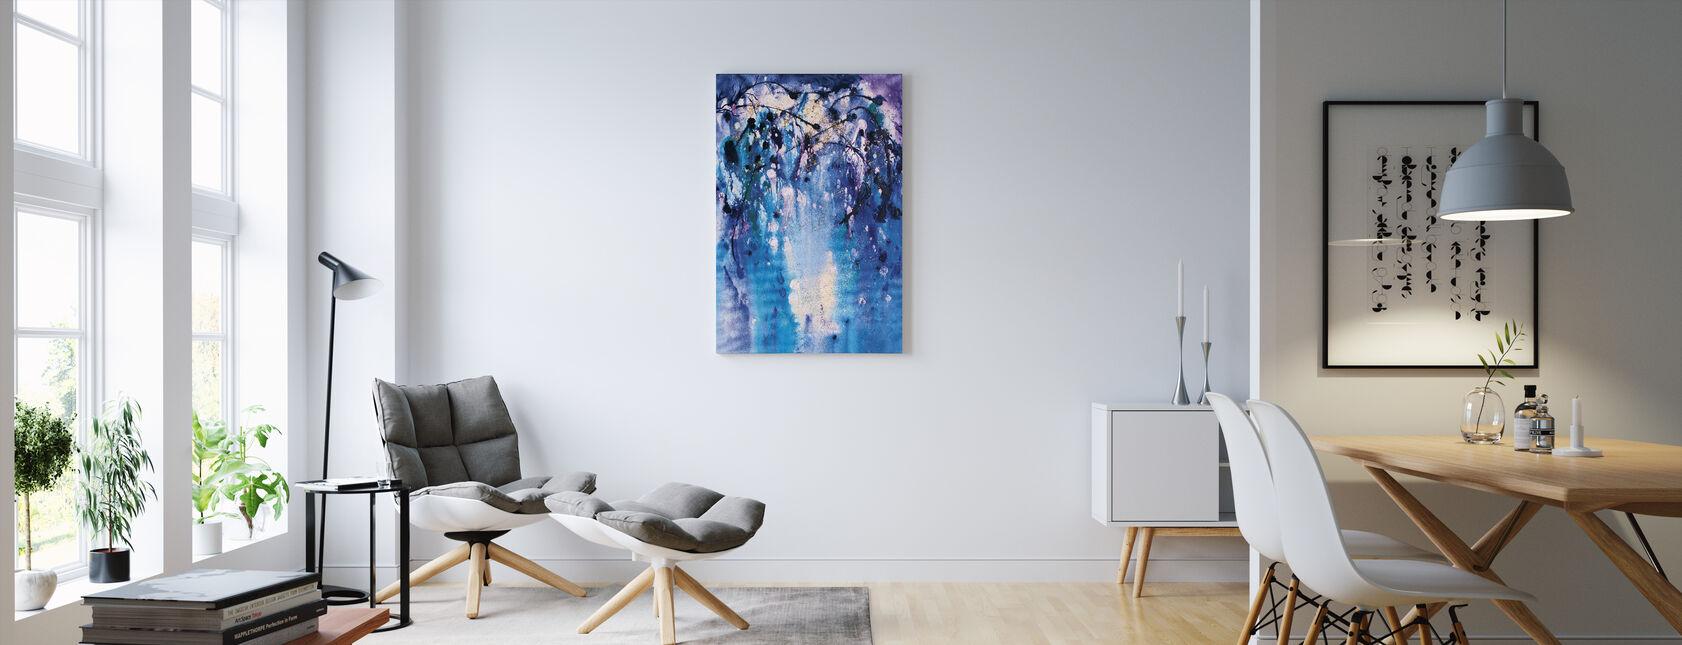 Bulletproof - Canvas print - Living Room